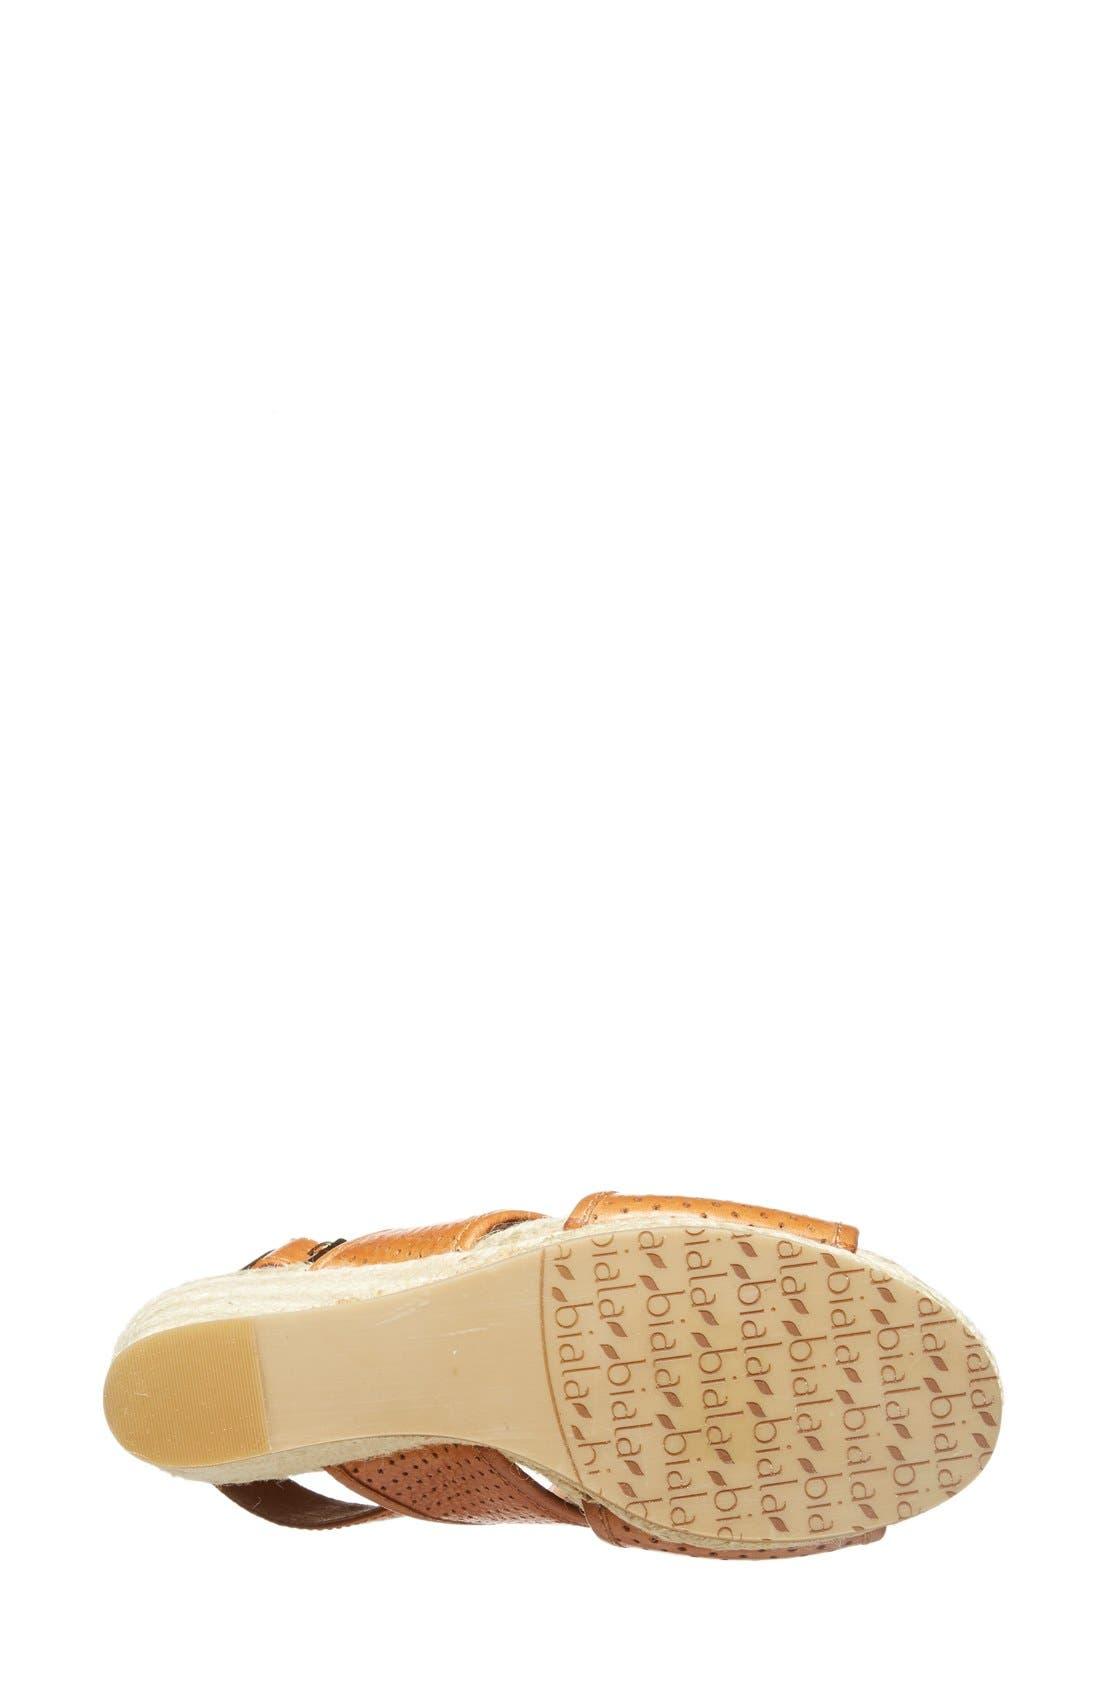 'Joyce' Perforated Espadrille Wedge Sandal,                             Alternate thumbnail 4, color,                             Brown